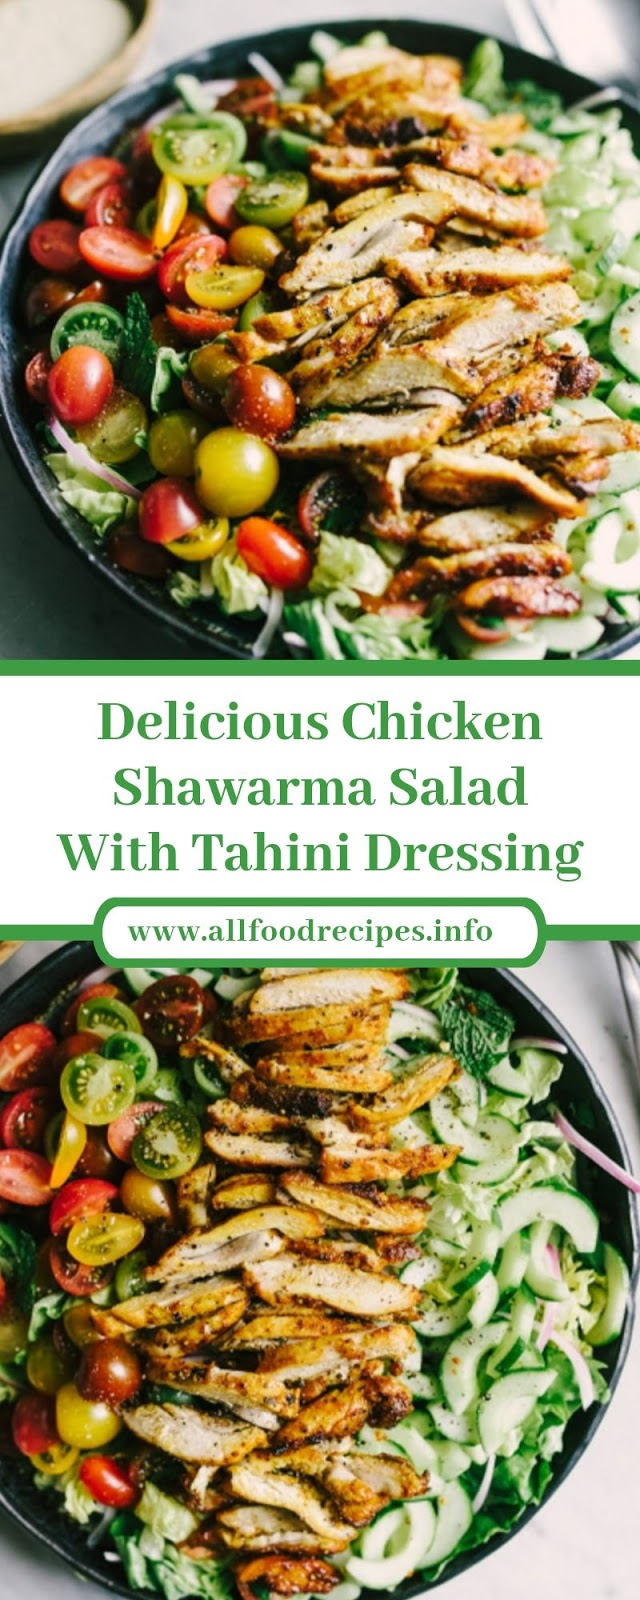 Delicious Chicken Shawarma Salad with Tahini Dressing